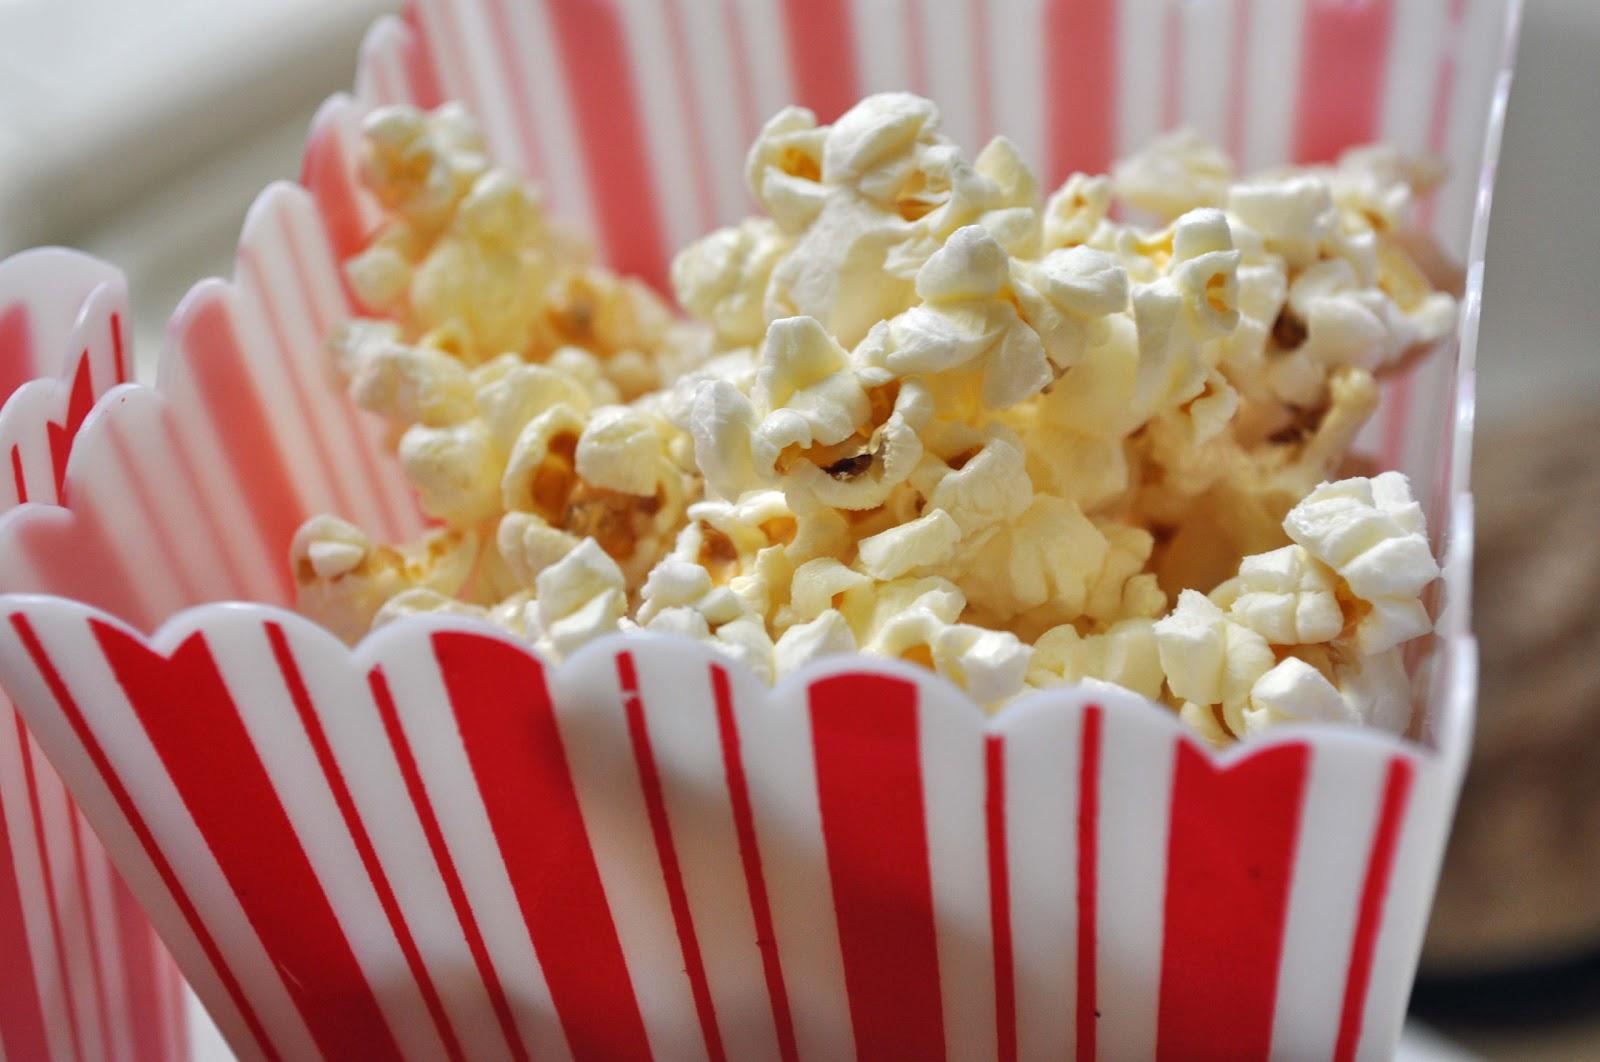 Homemade Microwave Popcorn - Laura K. Bray Designs